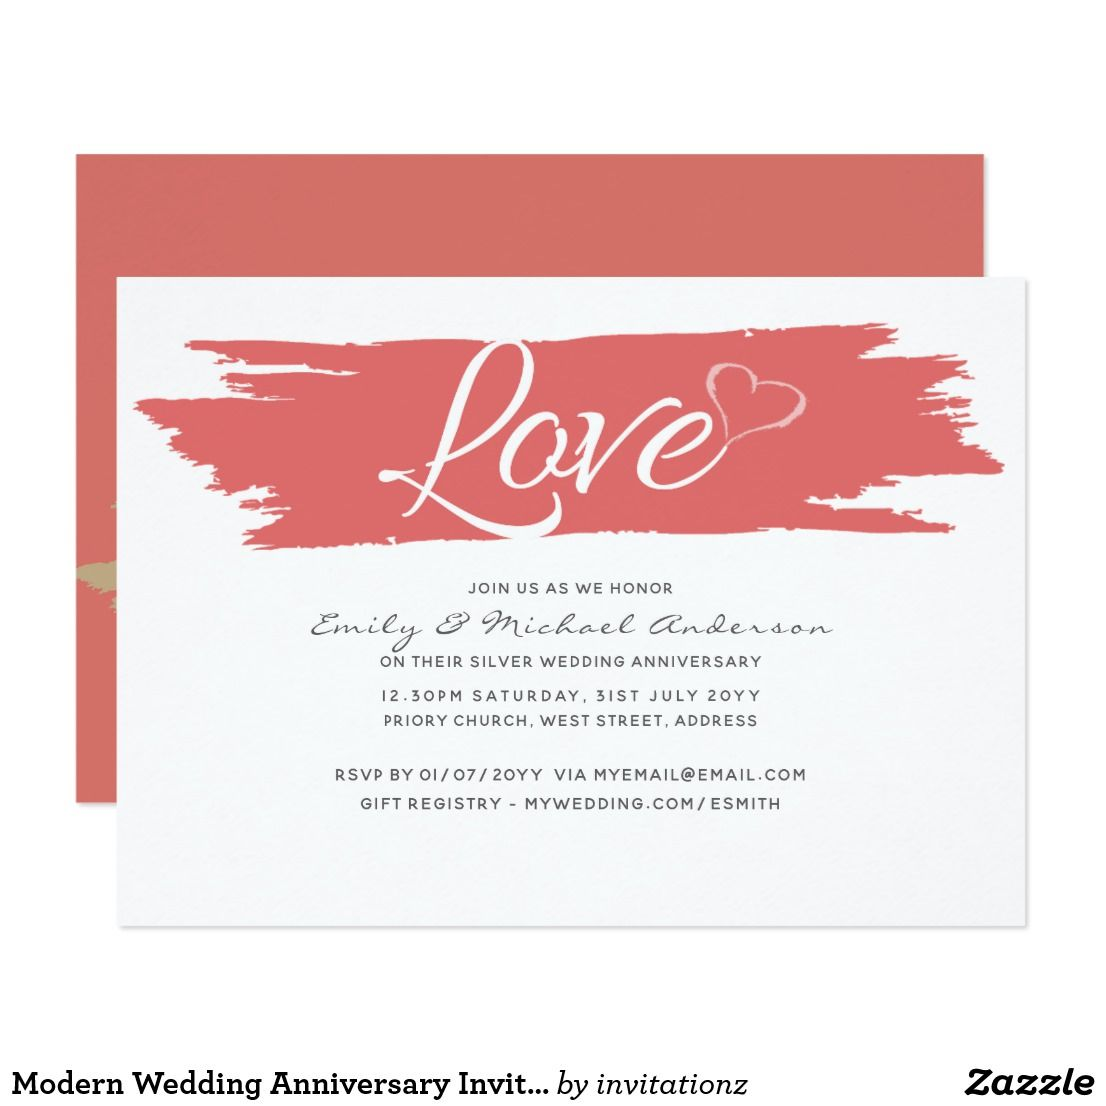 Modern Wedding Anniversary Invites - ANY MILESTONE | Wedding ...